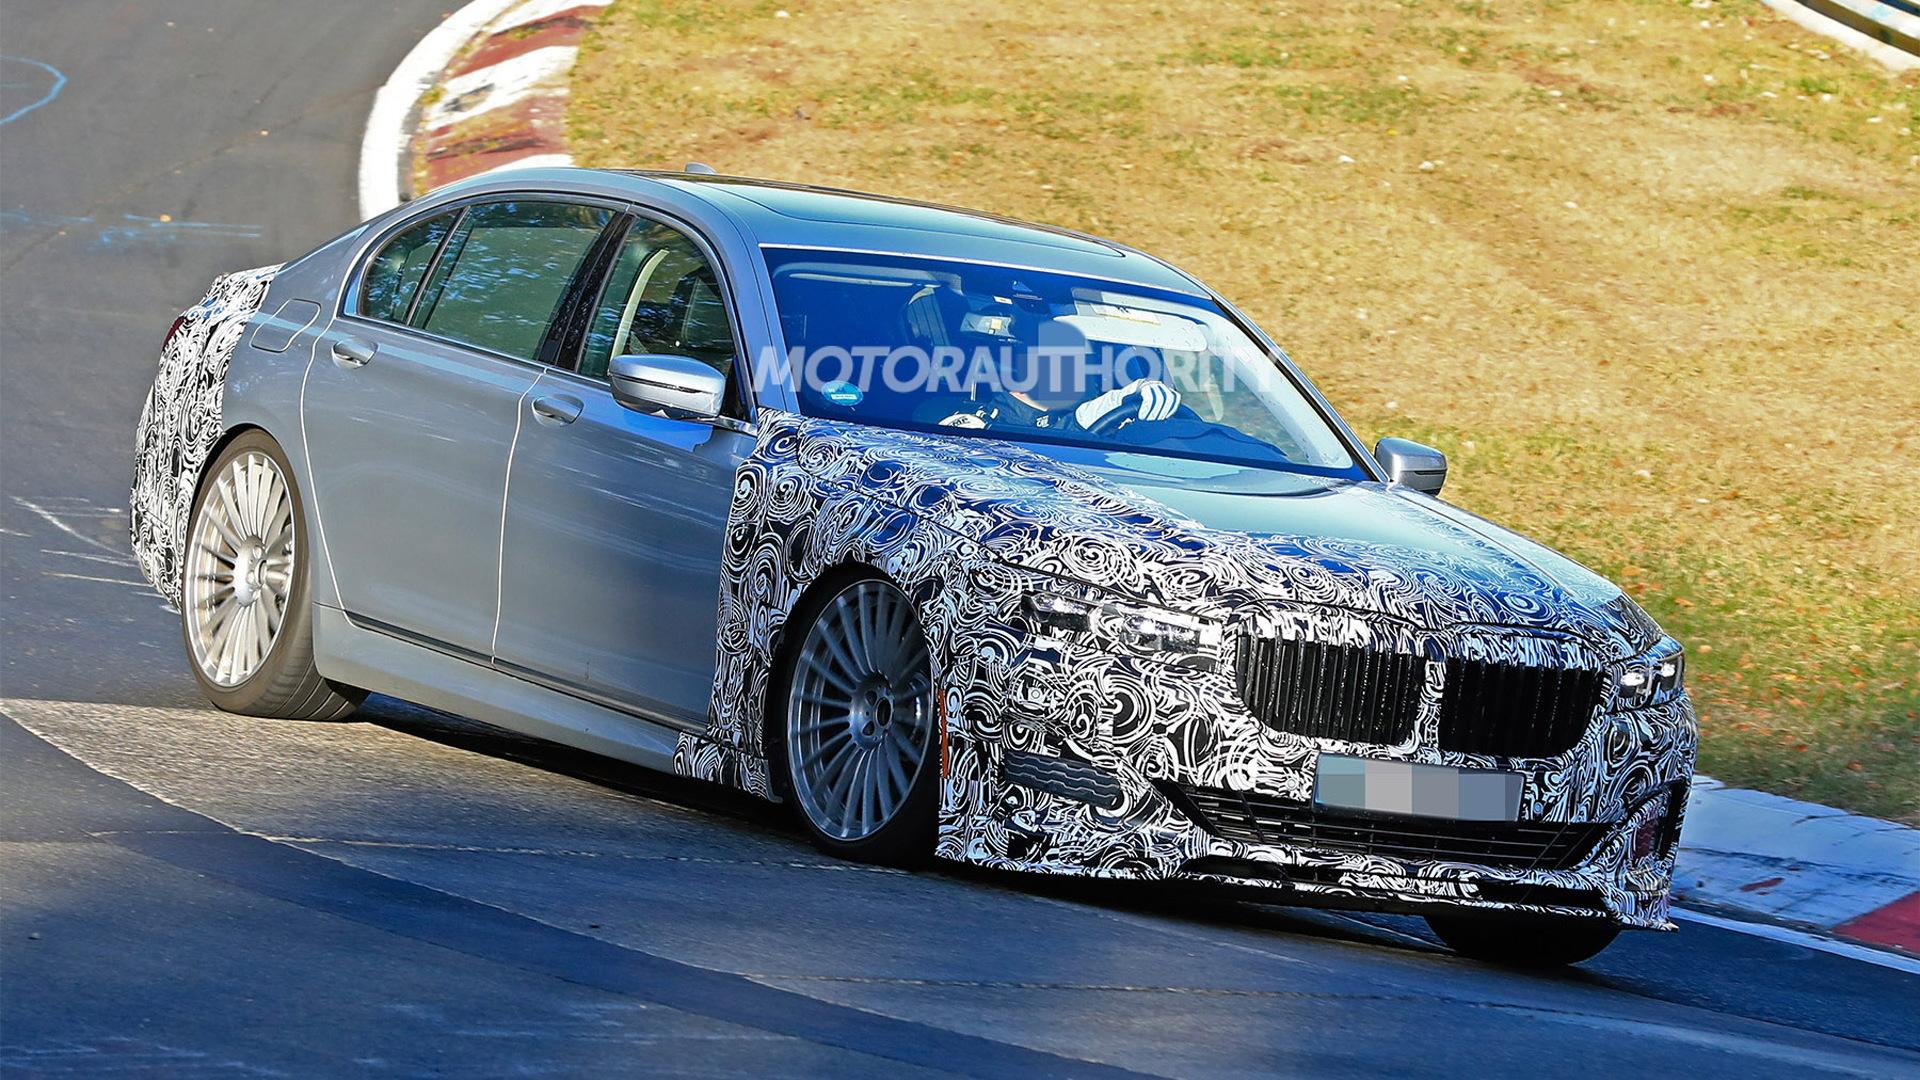 2020 BMW Alpina B7 facelift spy shots - Image via S. Baldauf/SB-Medien